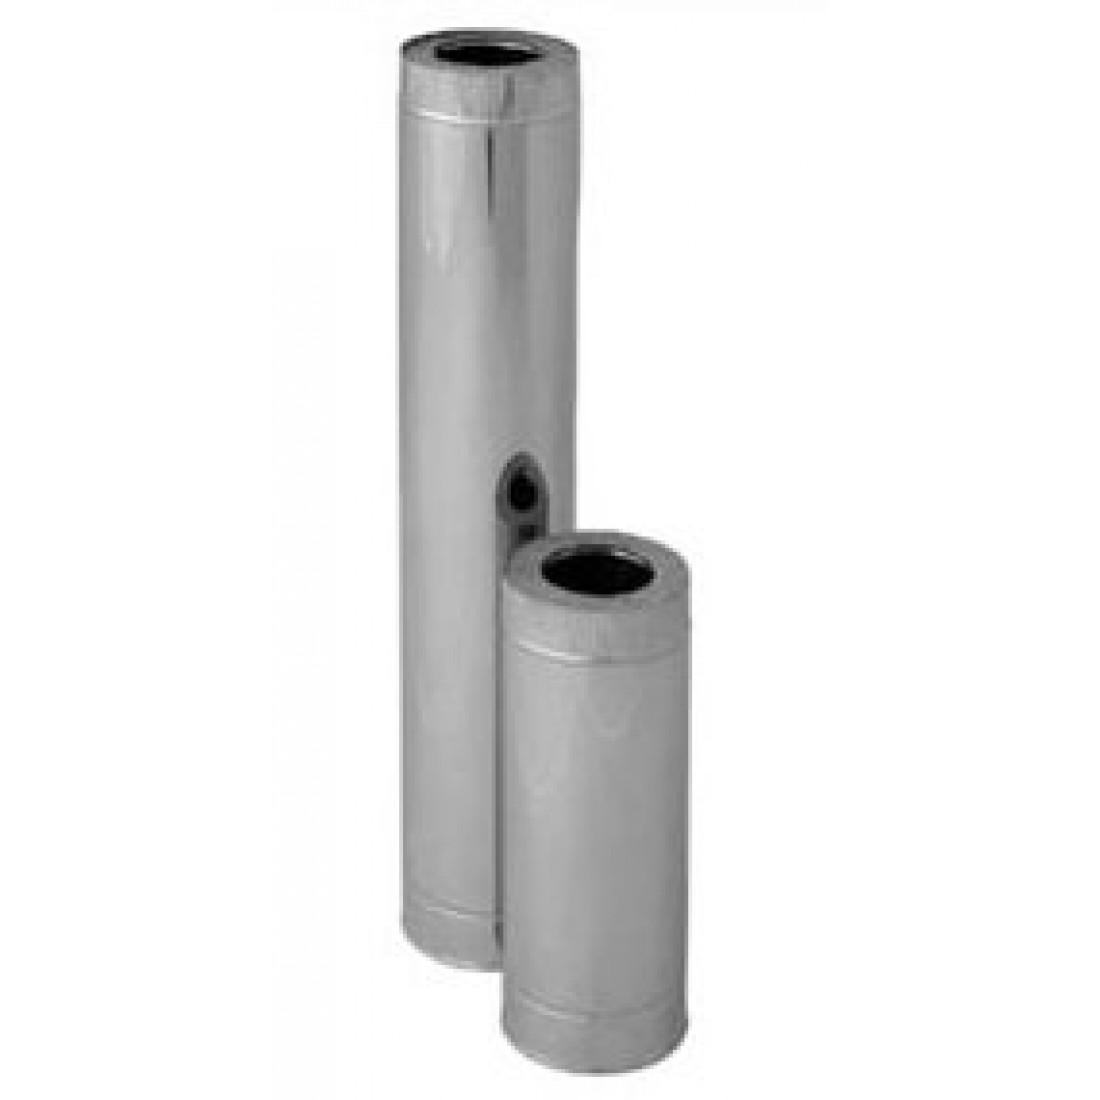 Сэндвич-труба для бани: монтаж, установка дымохода своими руками